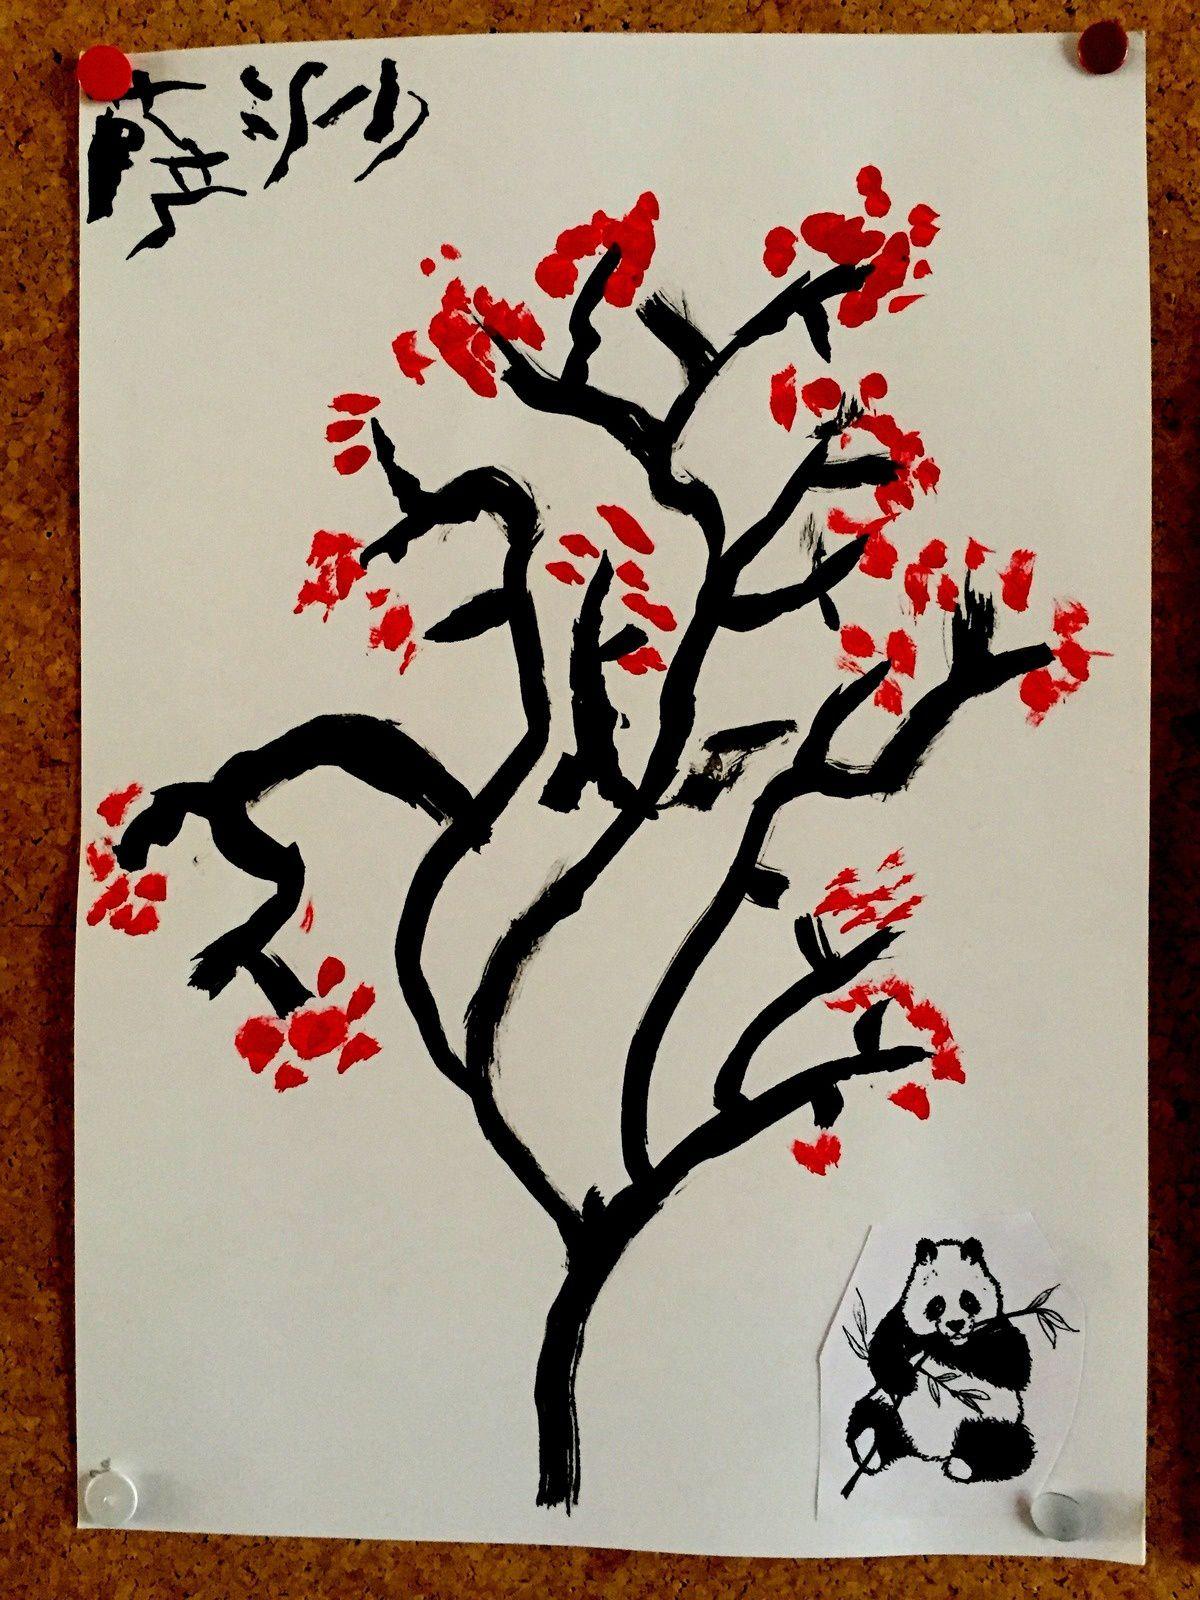 art enfant inspiration asiatique sur charlotteblablablog